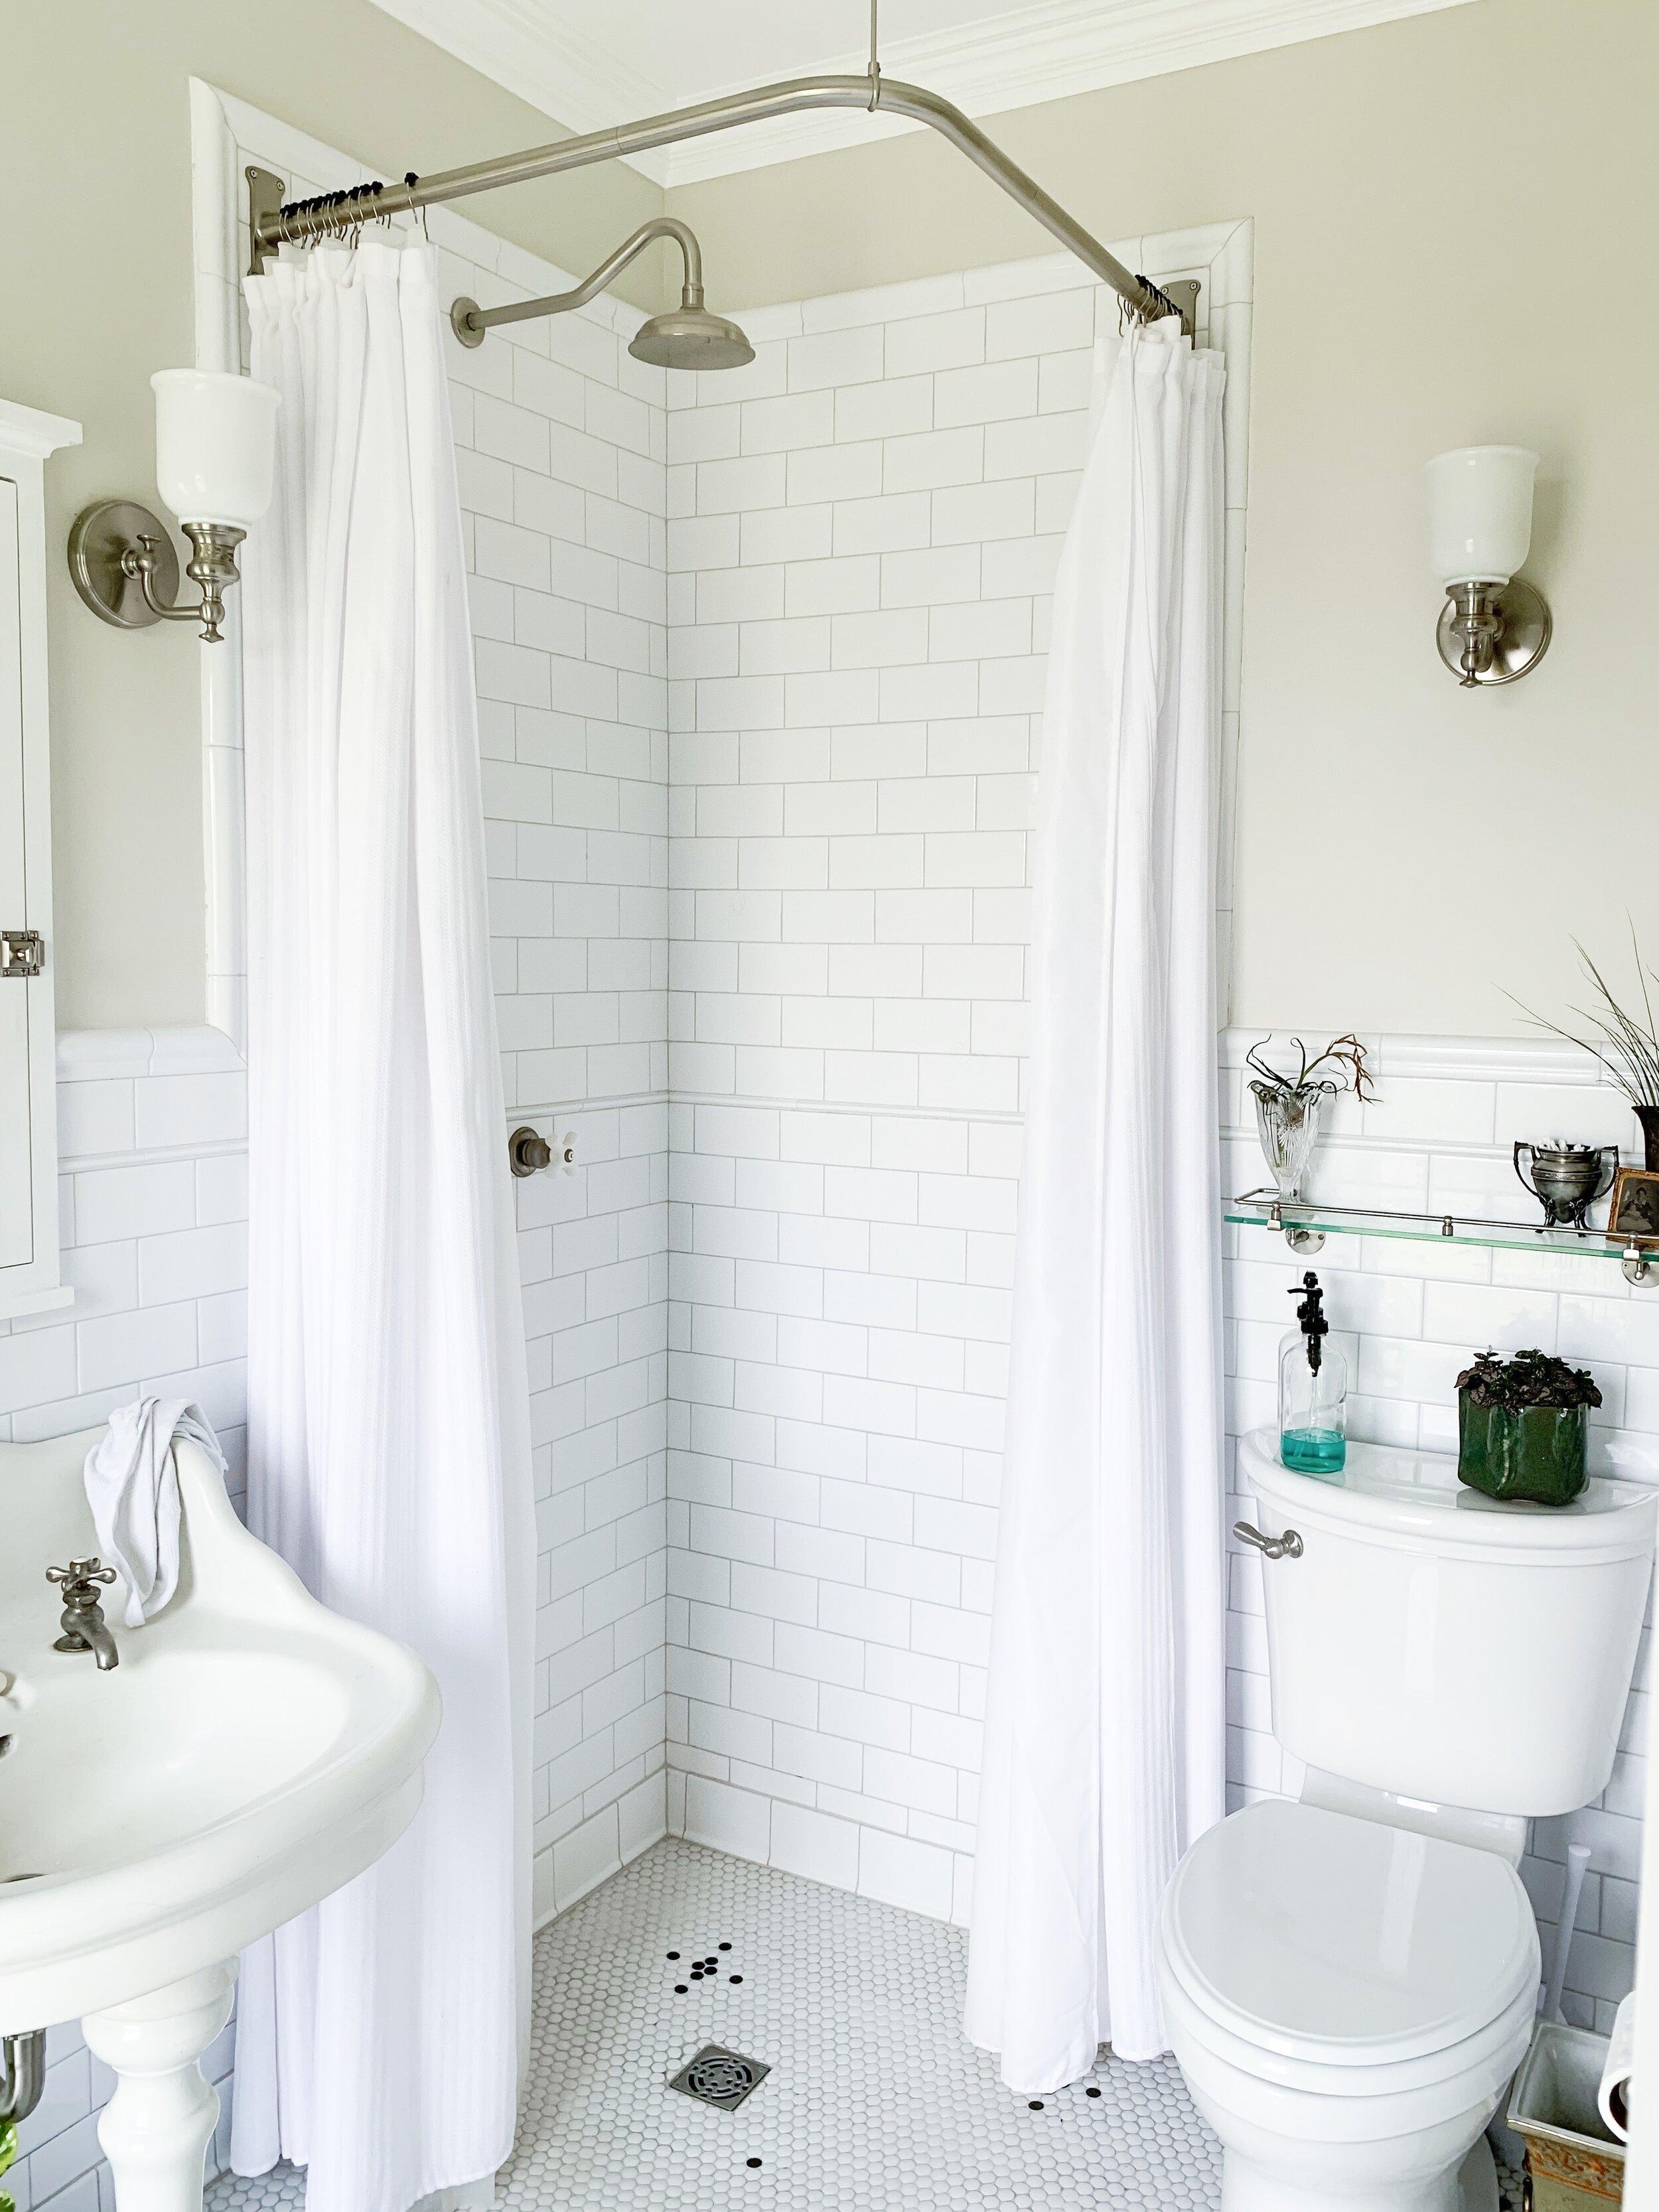 Shower Head  |  Shower Handles  |  Shower Curtain Rod  |  Shower Curtain  |  Shower Curtain Liner  |  Shower Curtain Hooks  |  Soap Holder